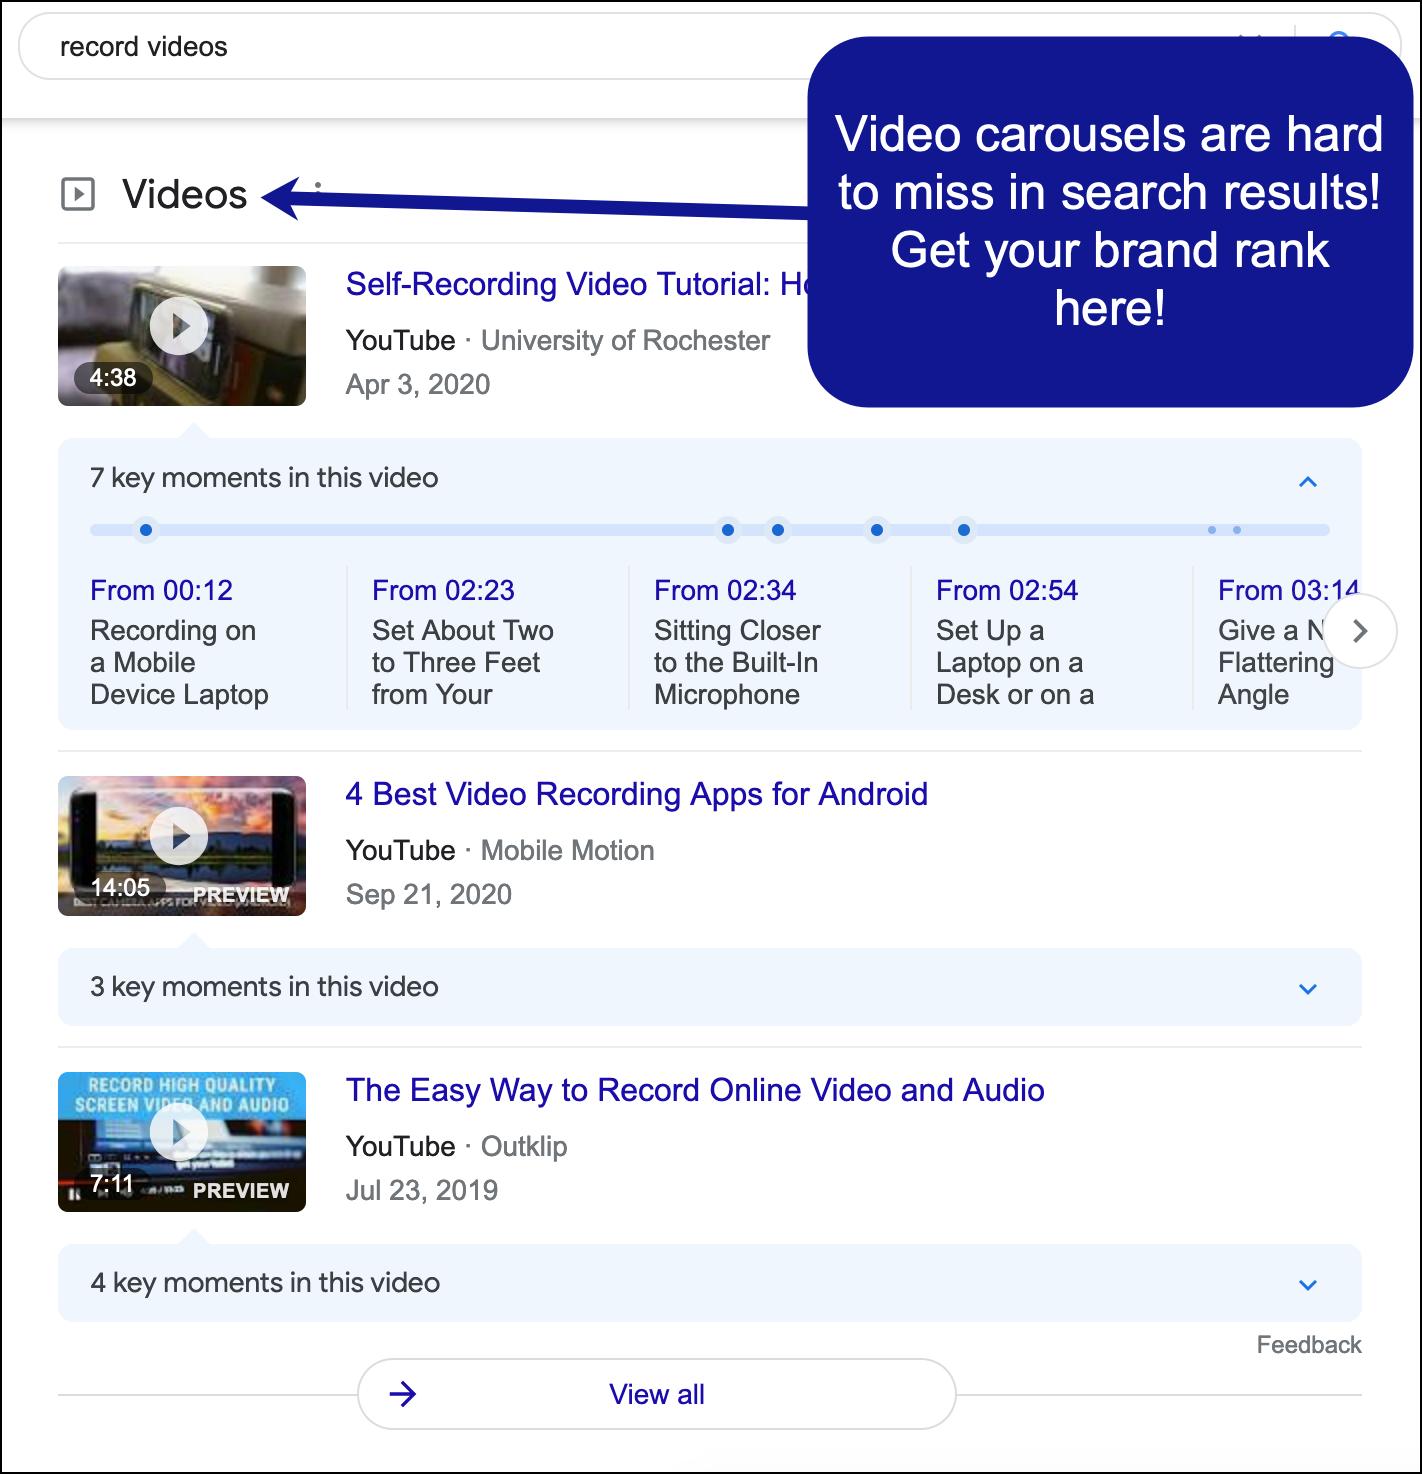 Esempio di caroselli video nei risultati di ricerca di Google